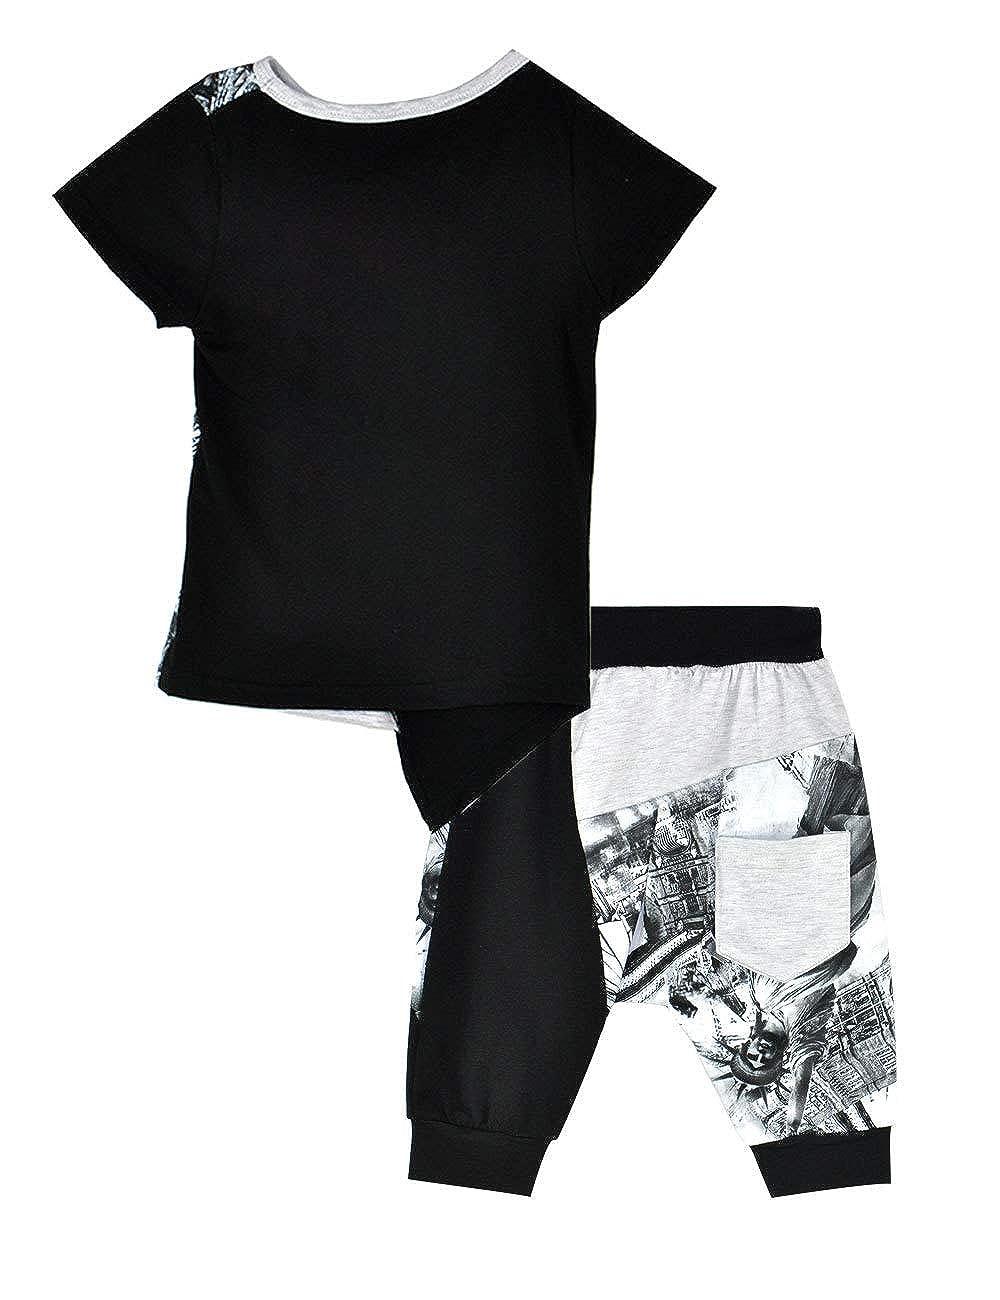 2T-7T Zernar Toddler Boys Short Set Clothing Sets Tee and Summer Clothing Sets